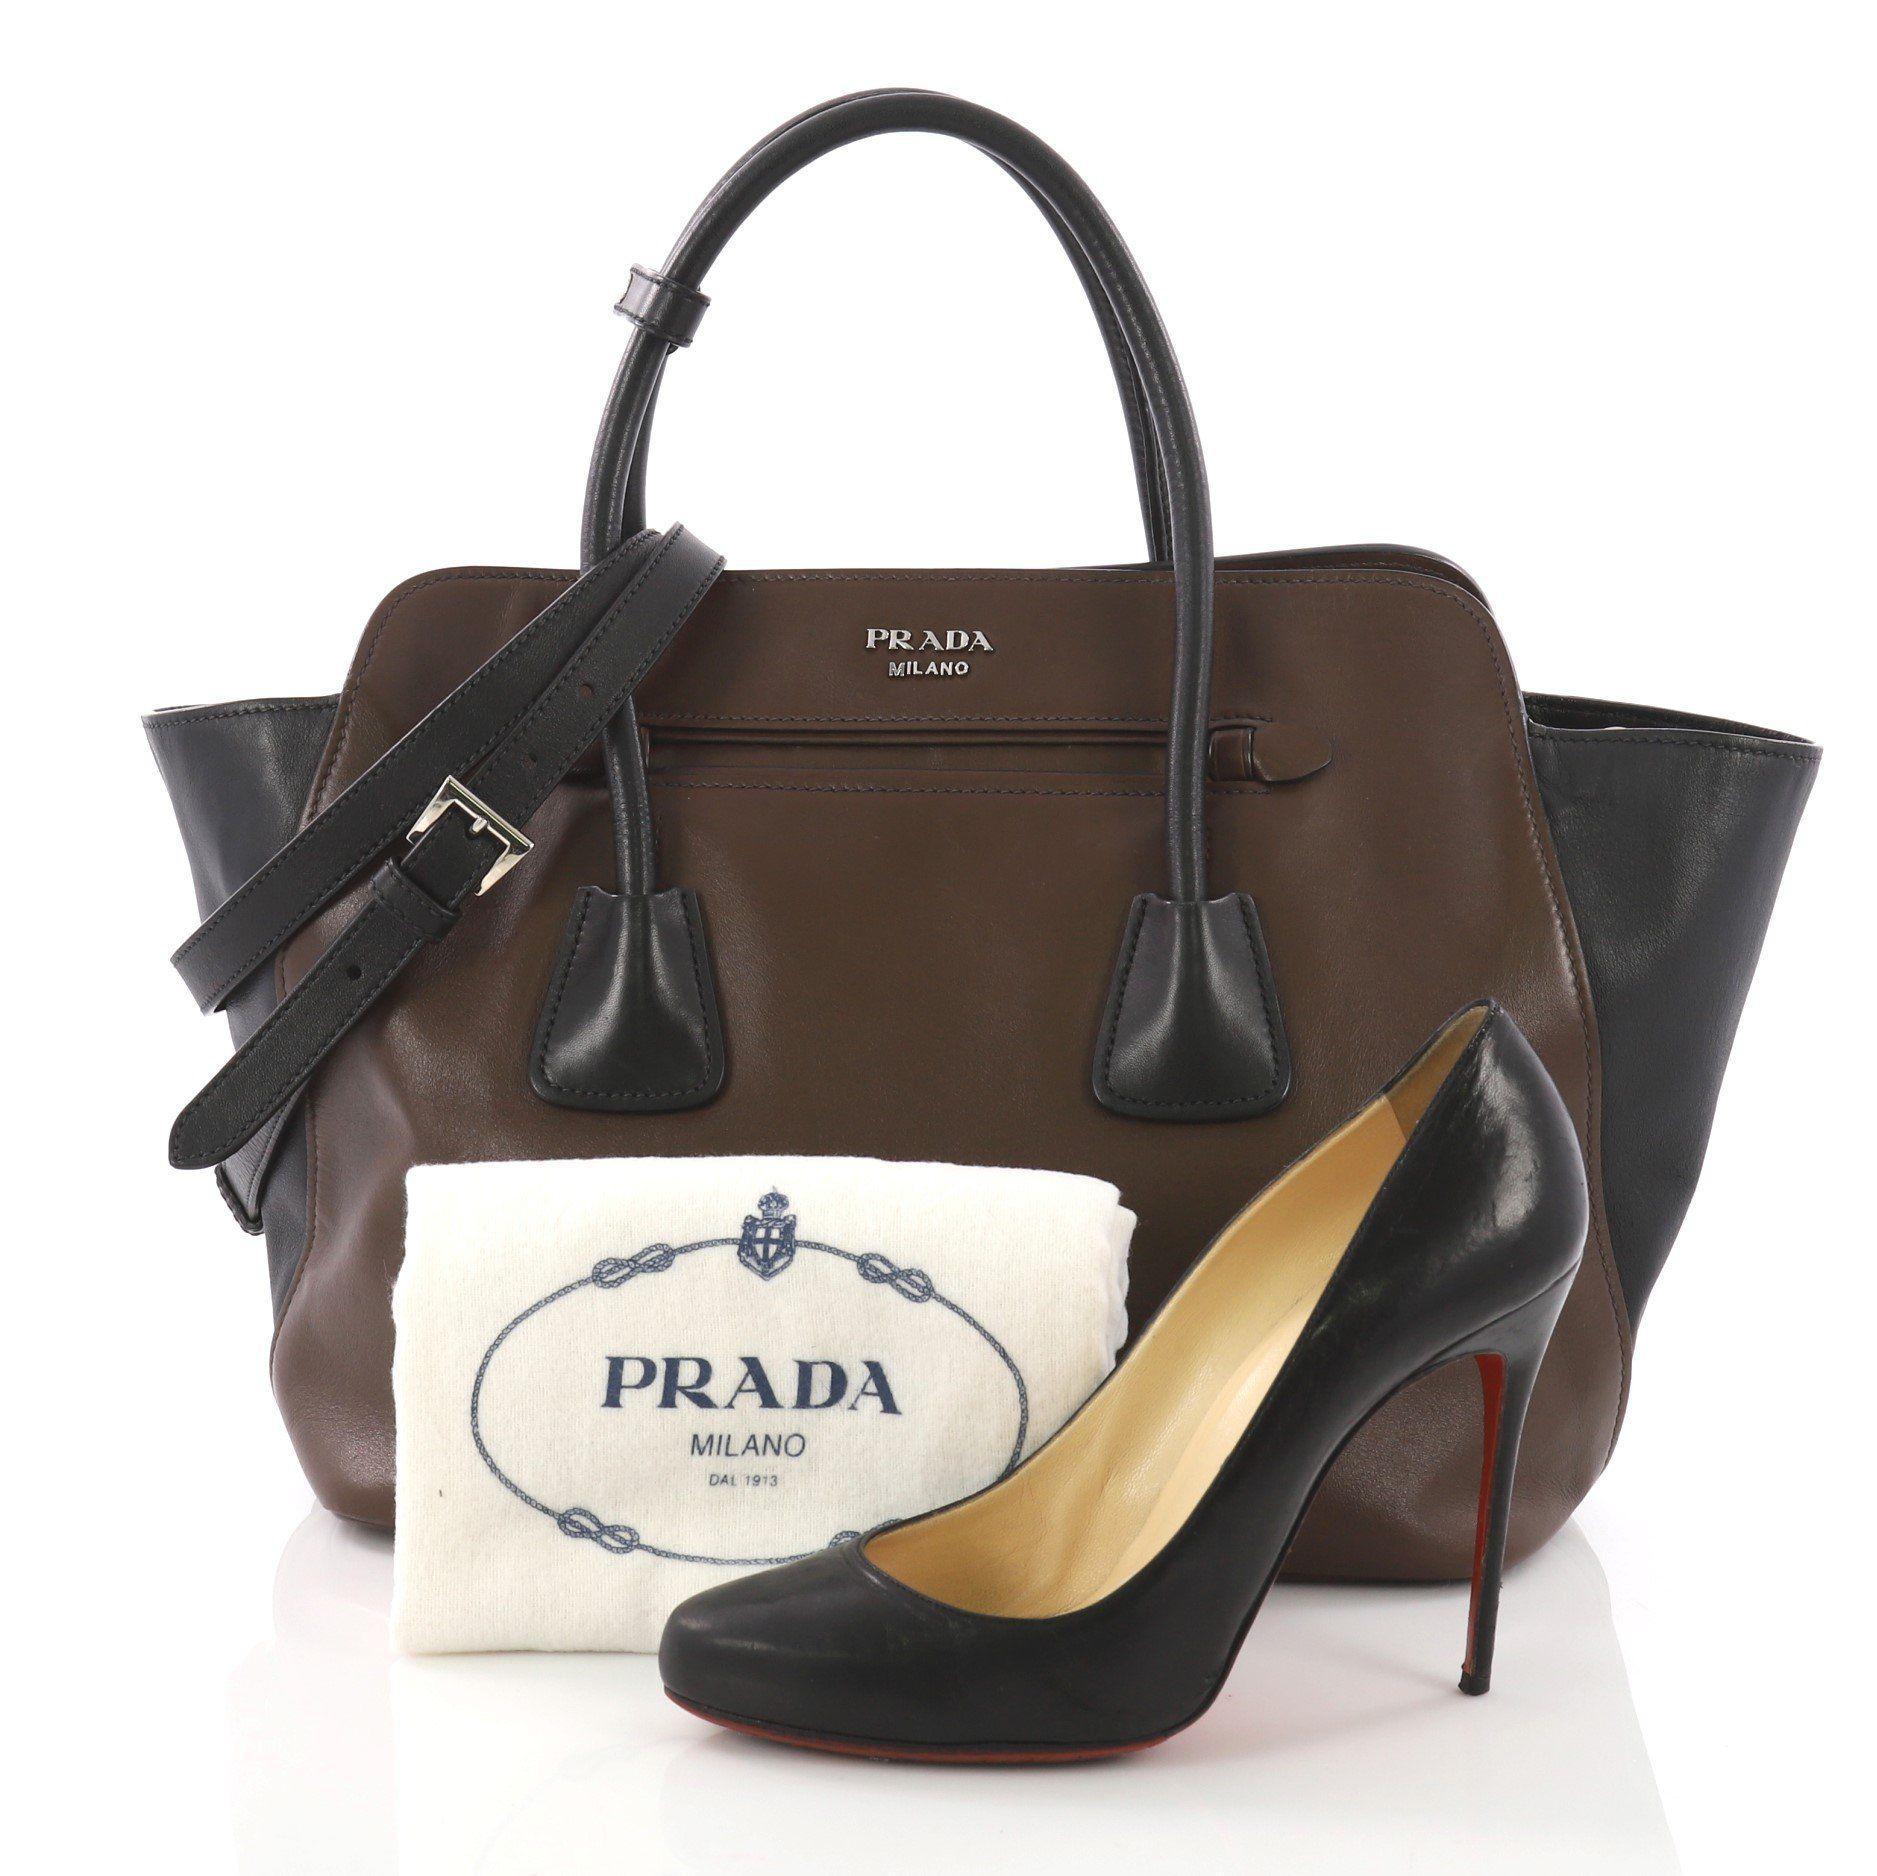 8c70678e93fc Prada - Brown Pre Owned Cuir Convertible Shopping Tote Soft Calfskin Large  - Lyst. View fullscreen